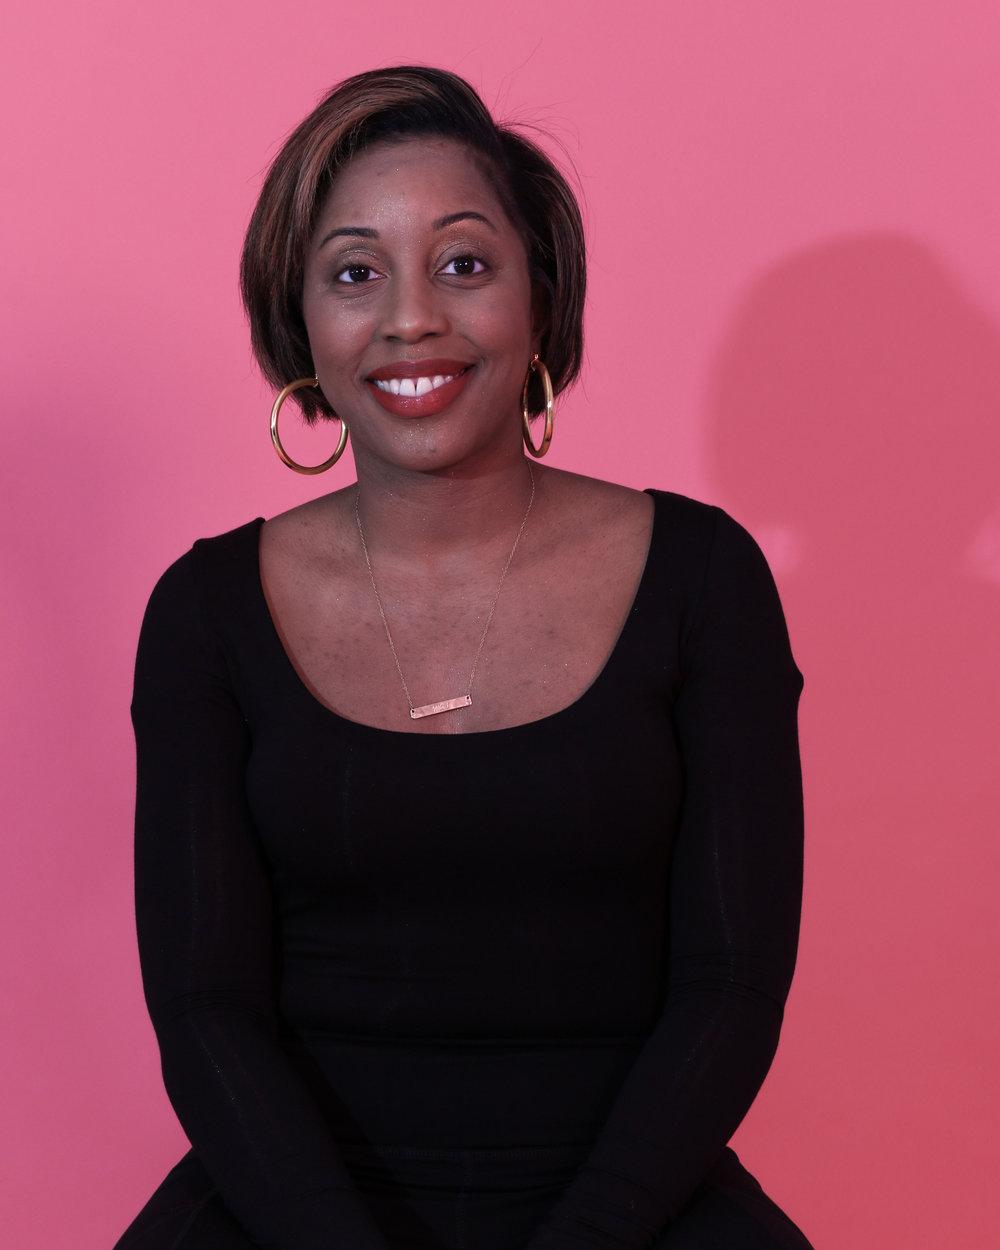 Amina Cush - African American, 31